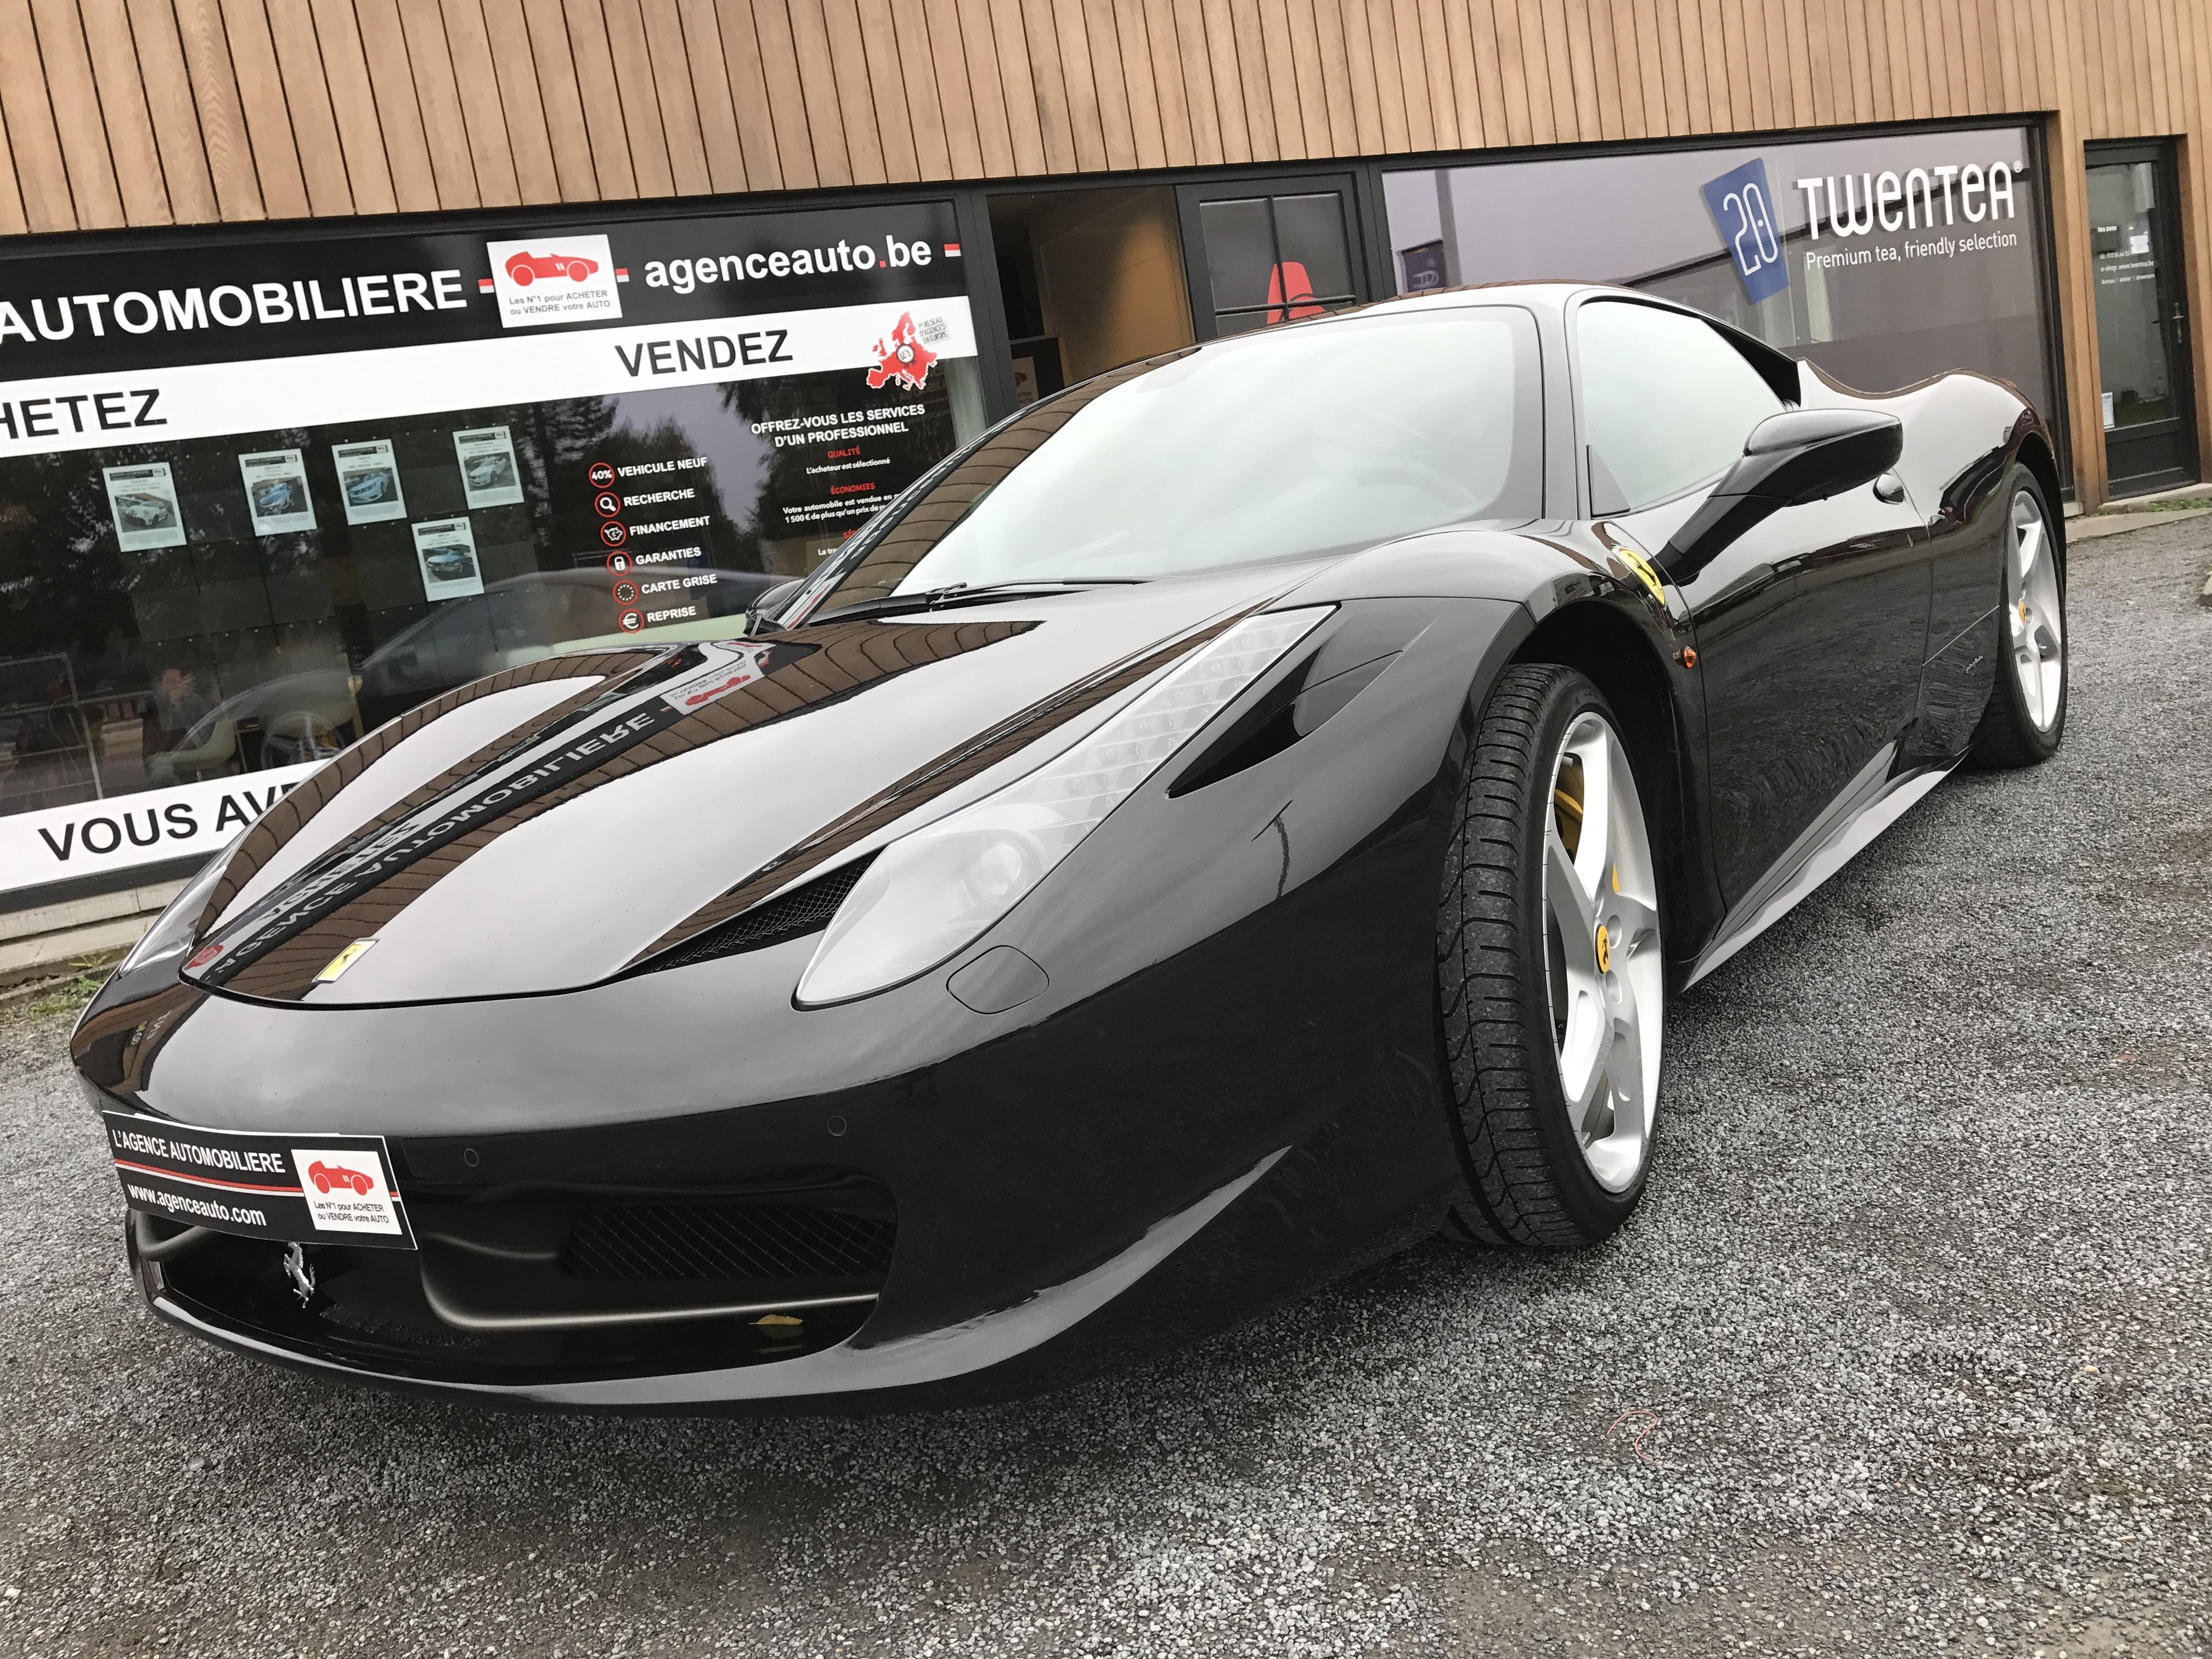 Ferrari 458 4527 CC ITALIA occasion Wavre pas cher, voiture occasion on ferrari f12 berlinetta, ferrari special, ferrari gto, ferrari 612 scaglietti, ferrari driver seat, ferrari f355, ferrari 458italia, ferrari italia, ferrari cars, ferrari f430, ferrari models, ferrari supercar, ferrari fxx, ferrari lamborghini, ferrari testarossa,